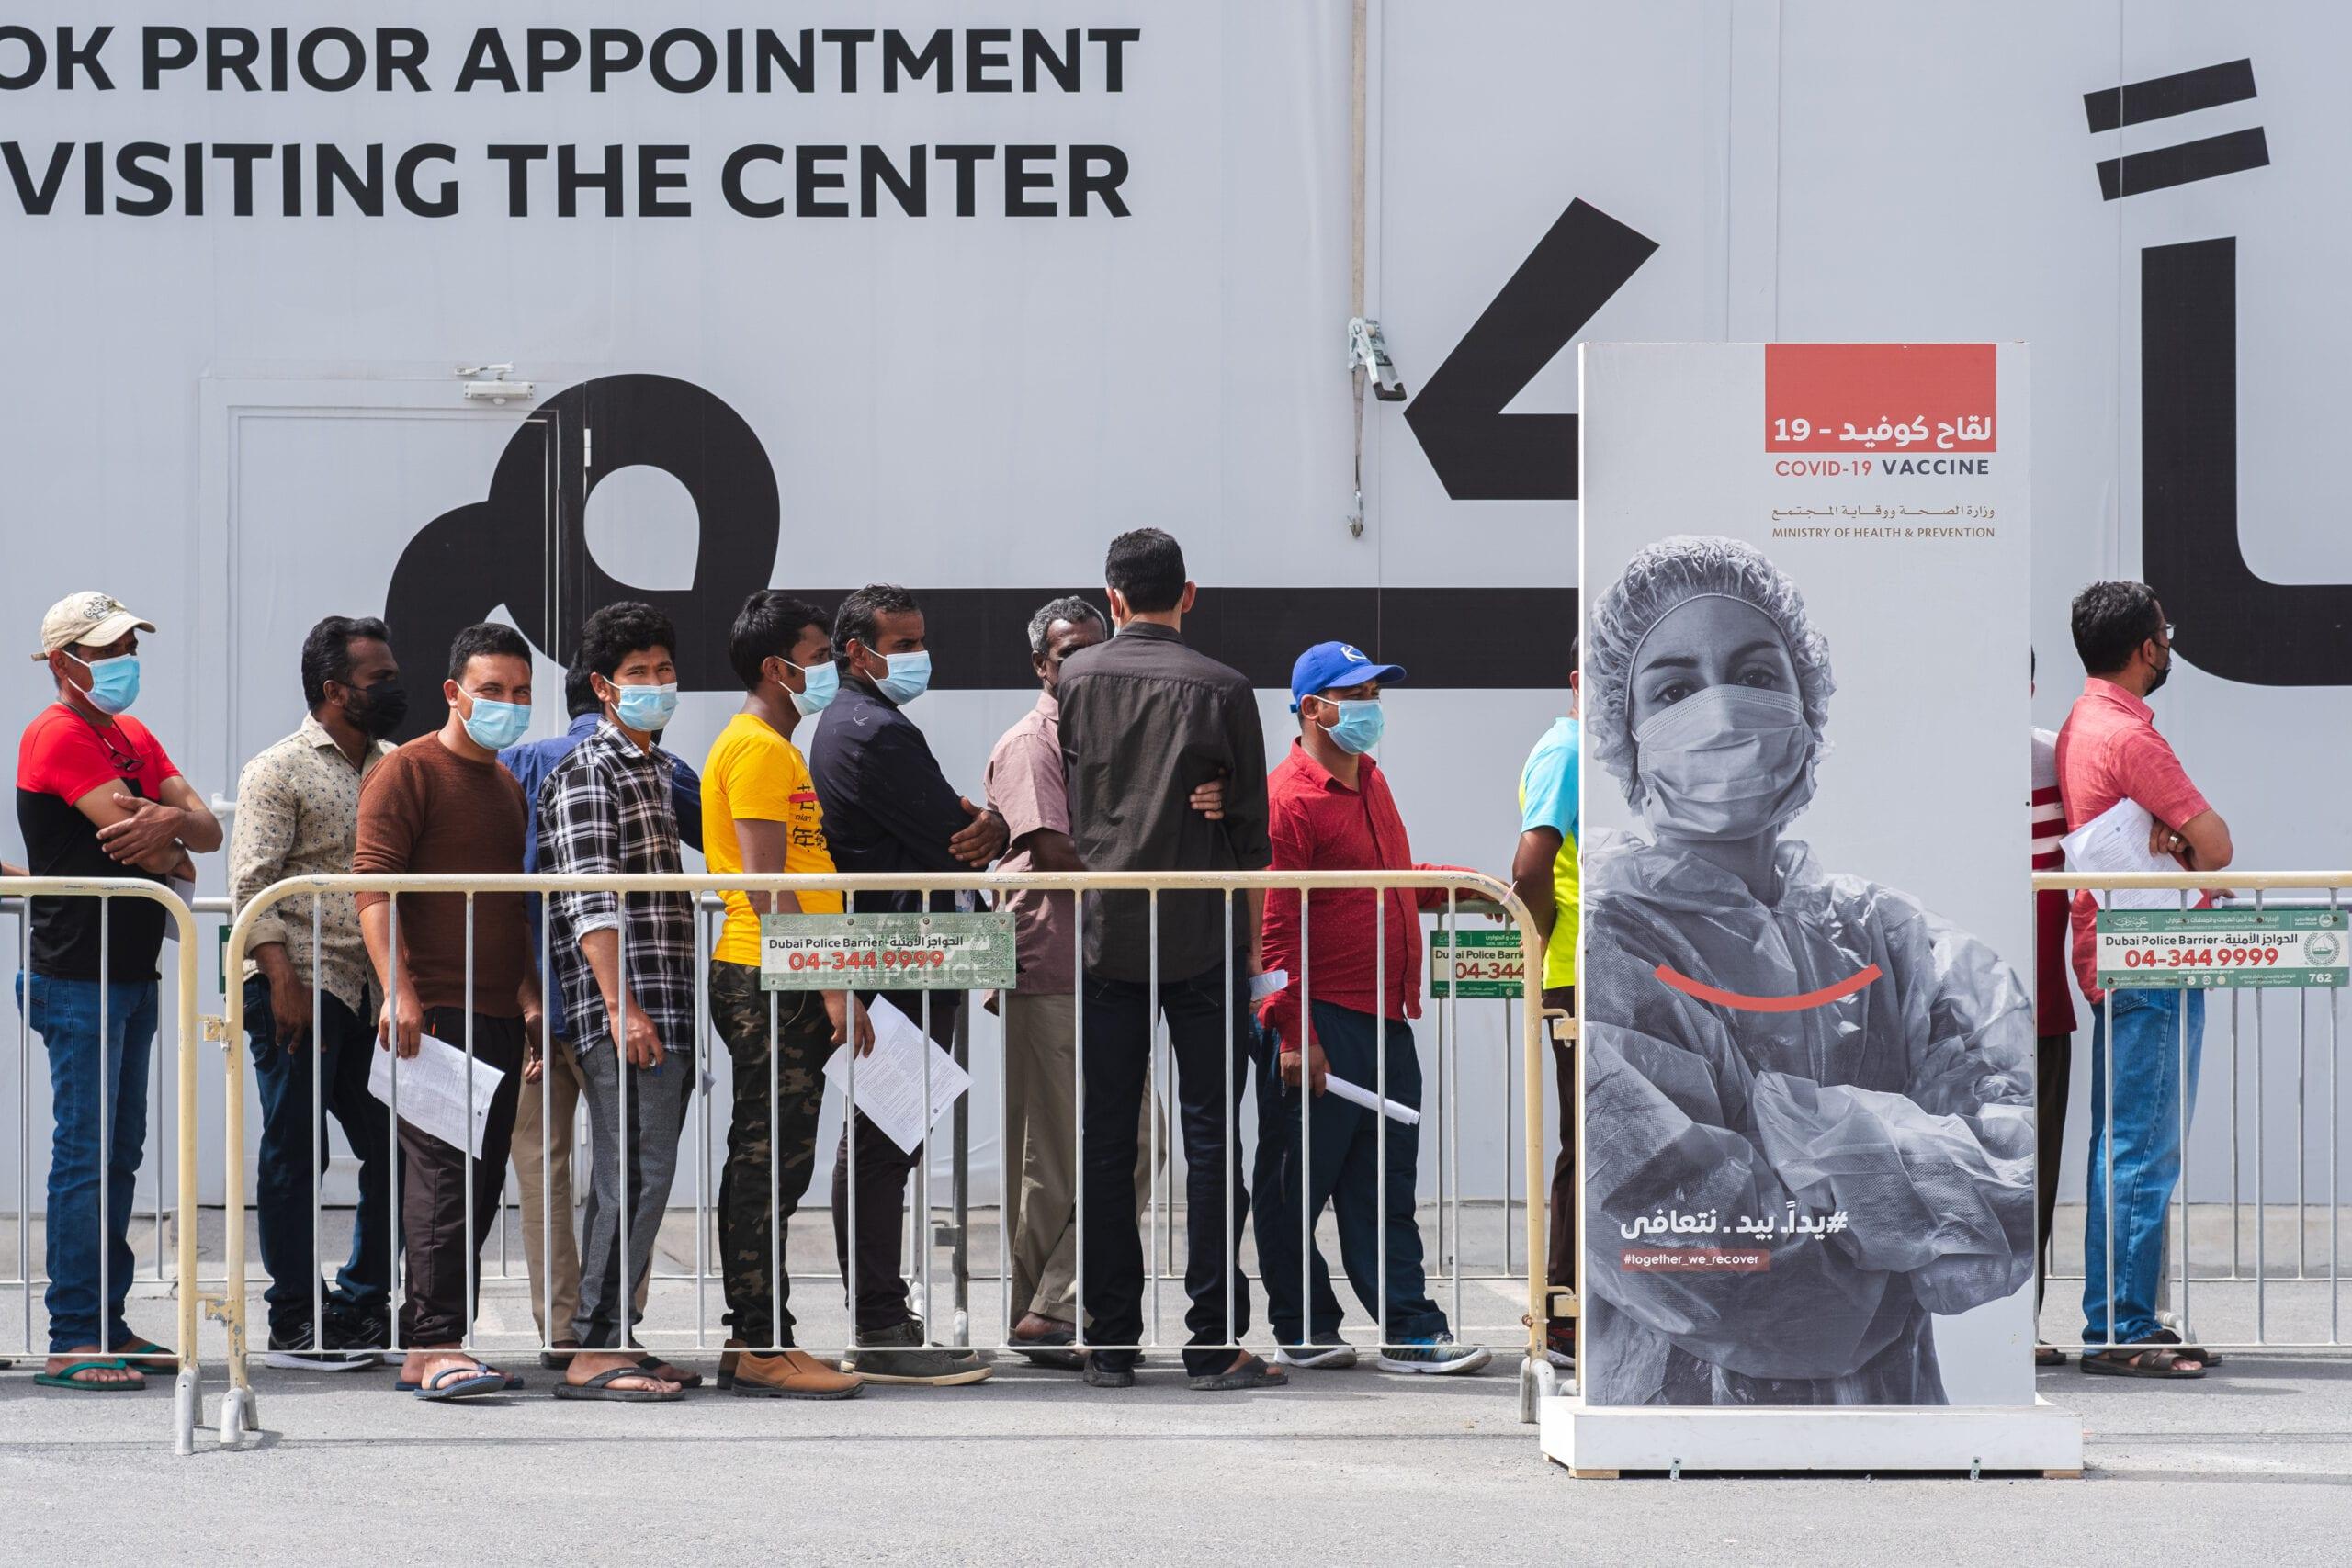 Citizens queuing for the Covid-19 vaccine in Al Wasl, Dubai, UAE (Photo: Shutterstock)